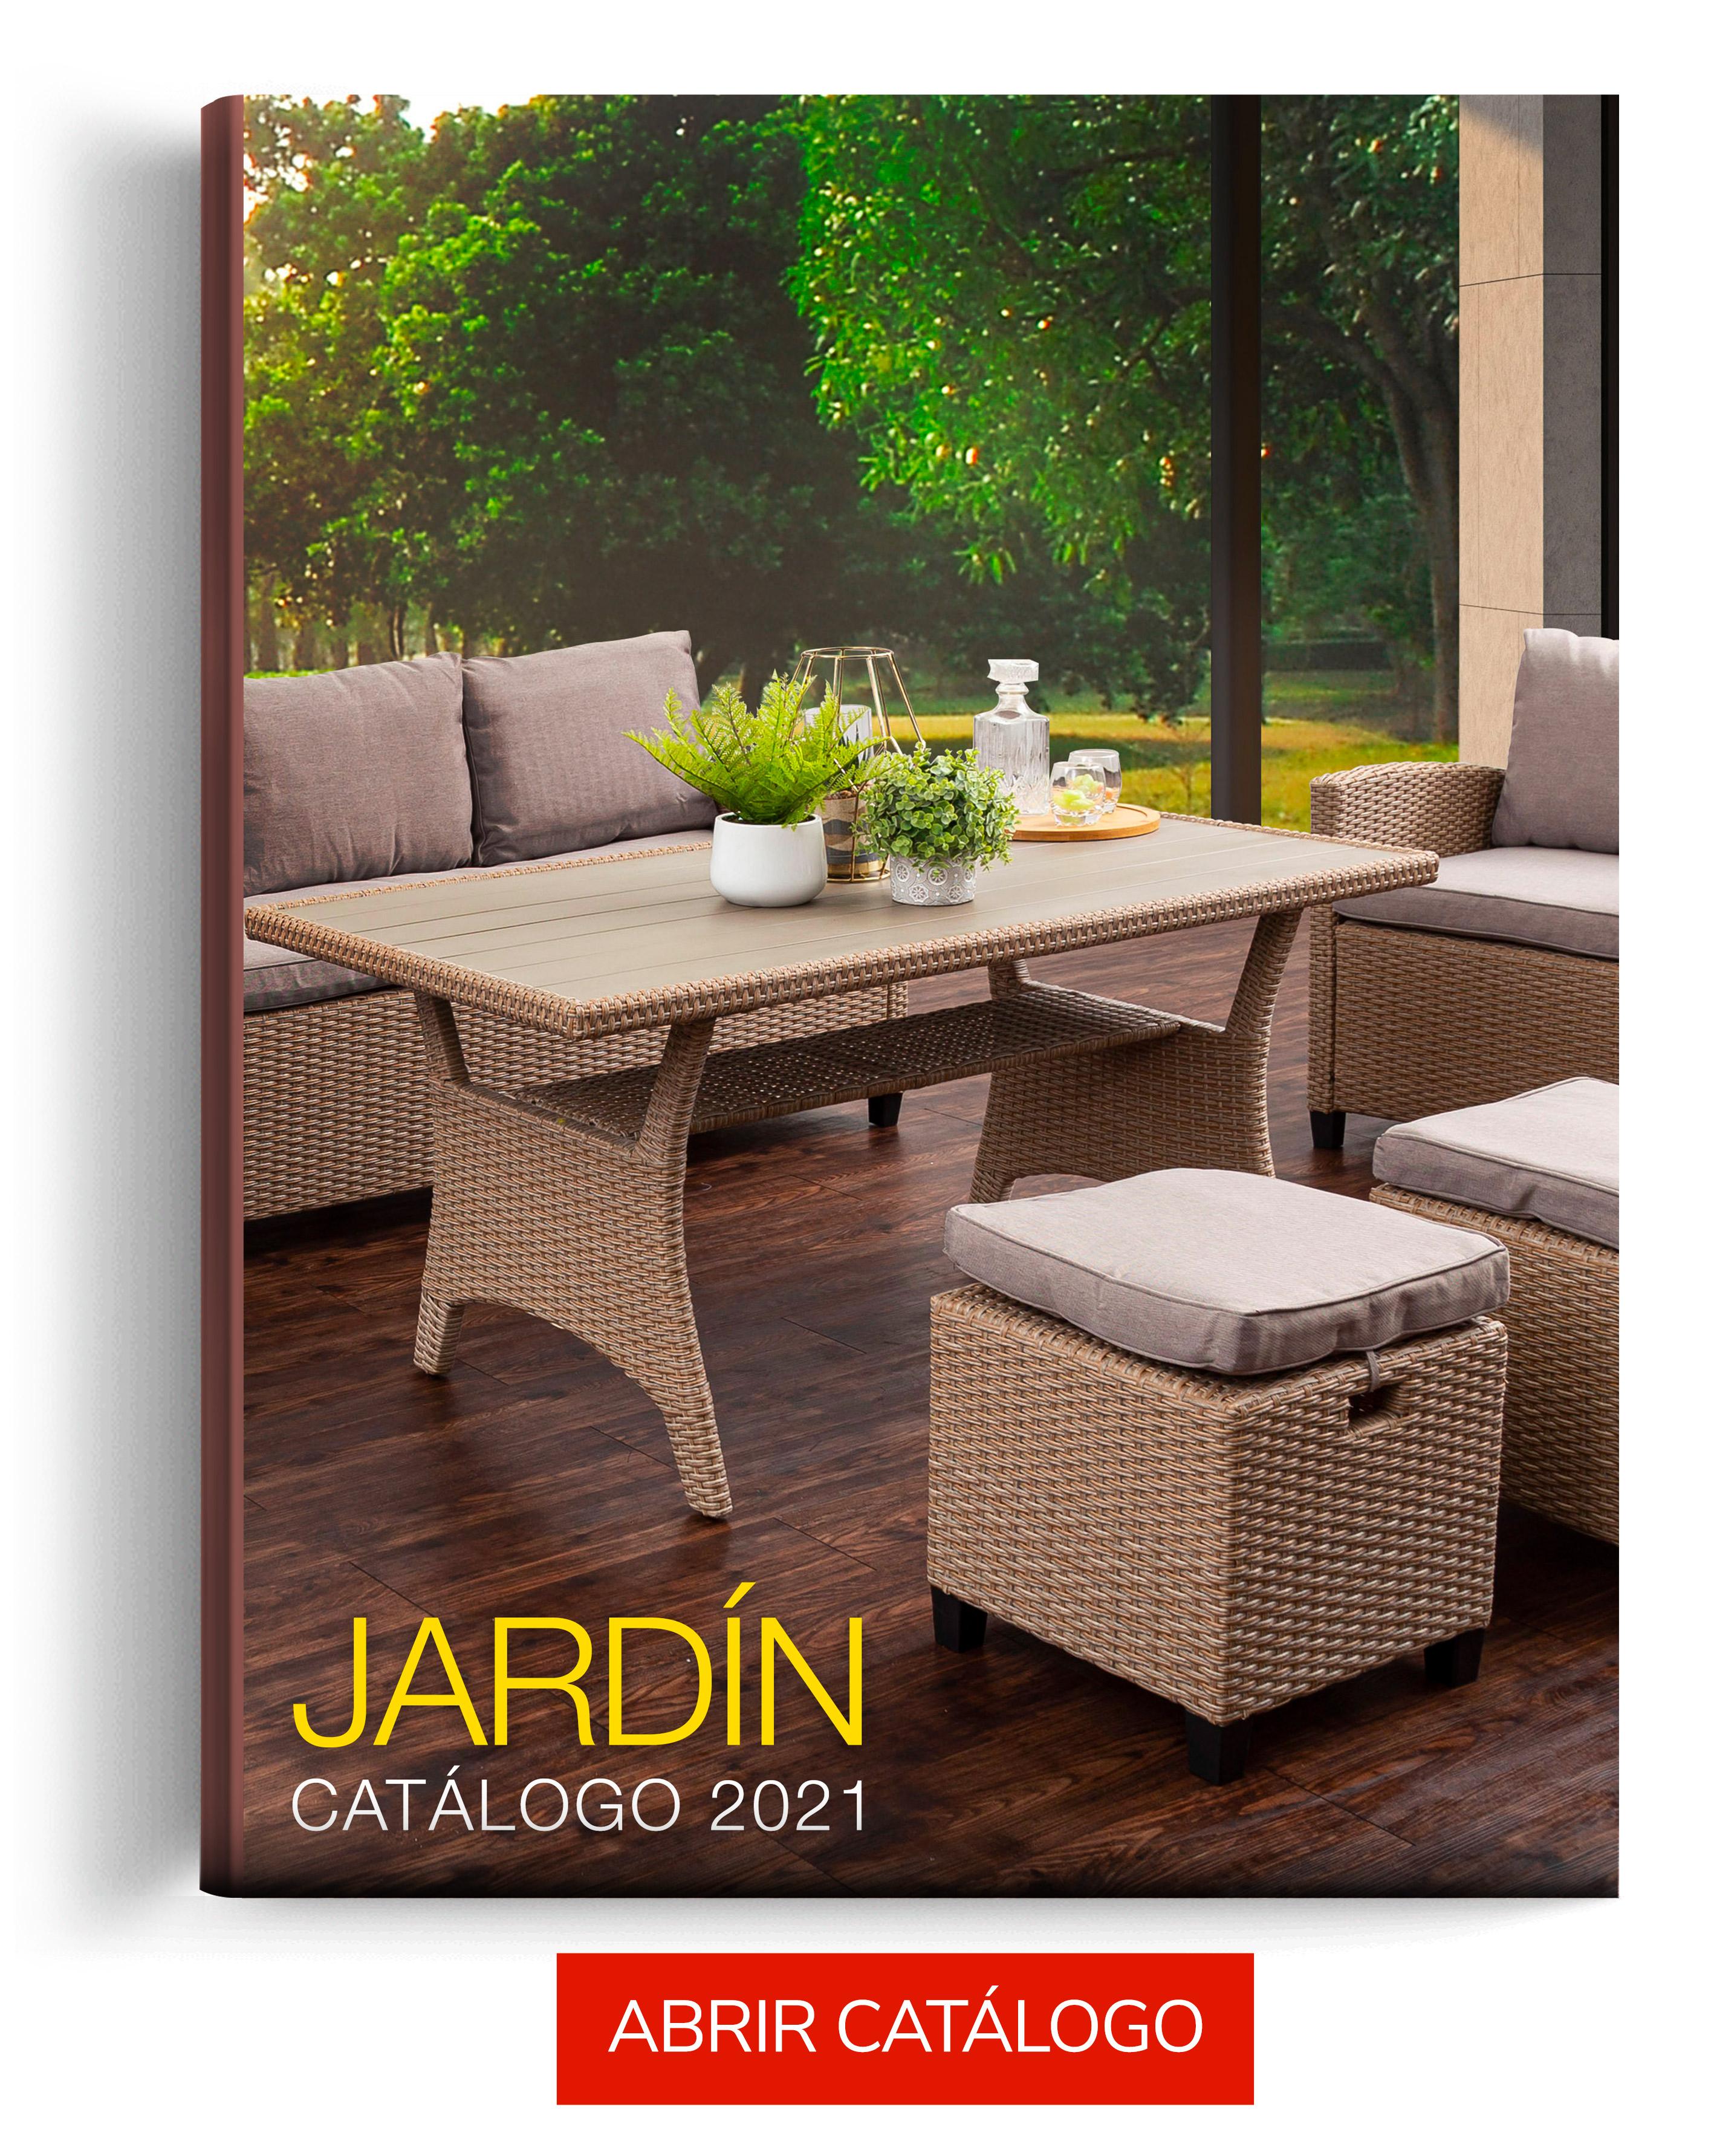 portada_catalogo_jardin_nuevo2